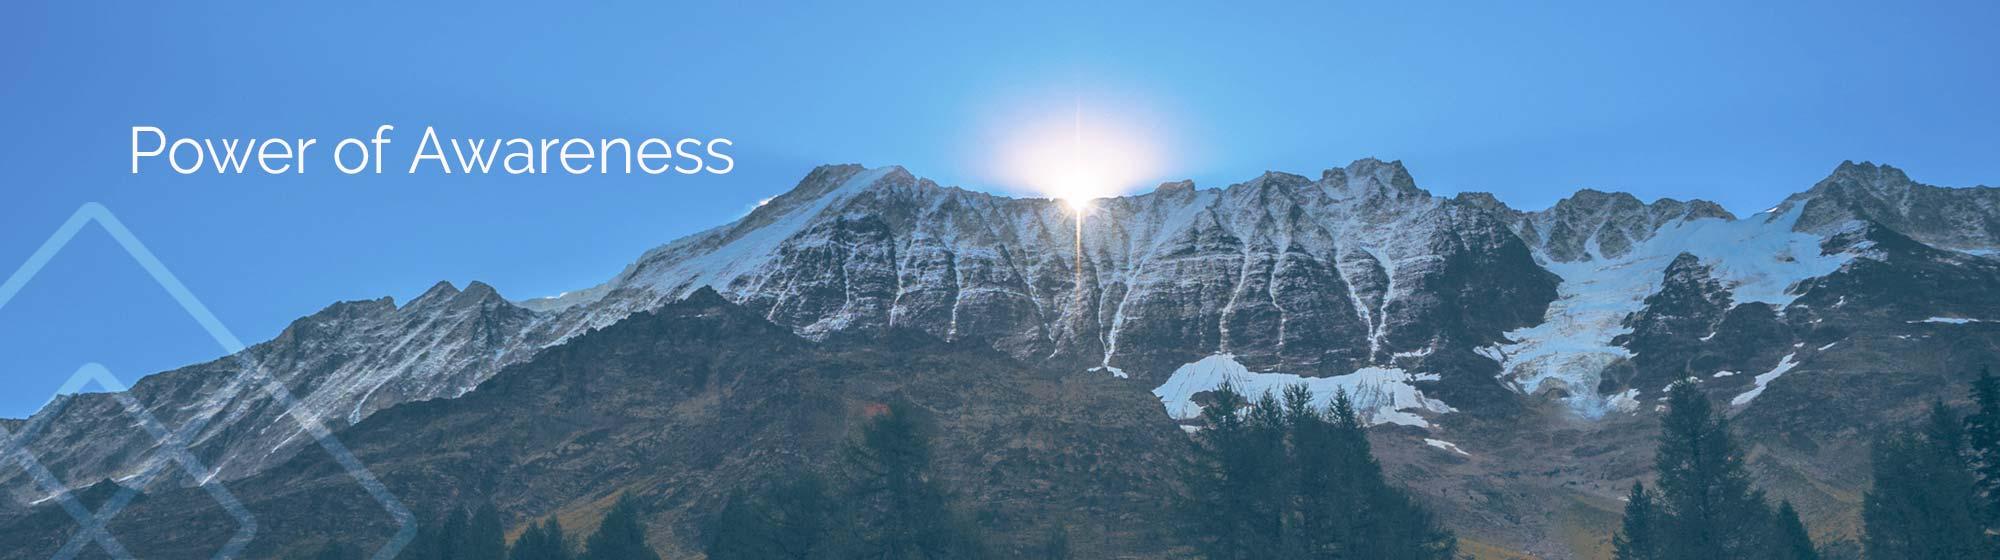 nandi_header_mountain_2_powerofawareness